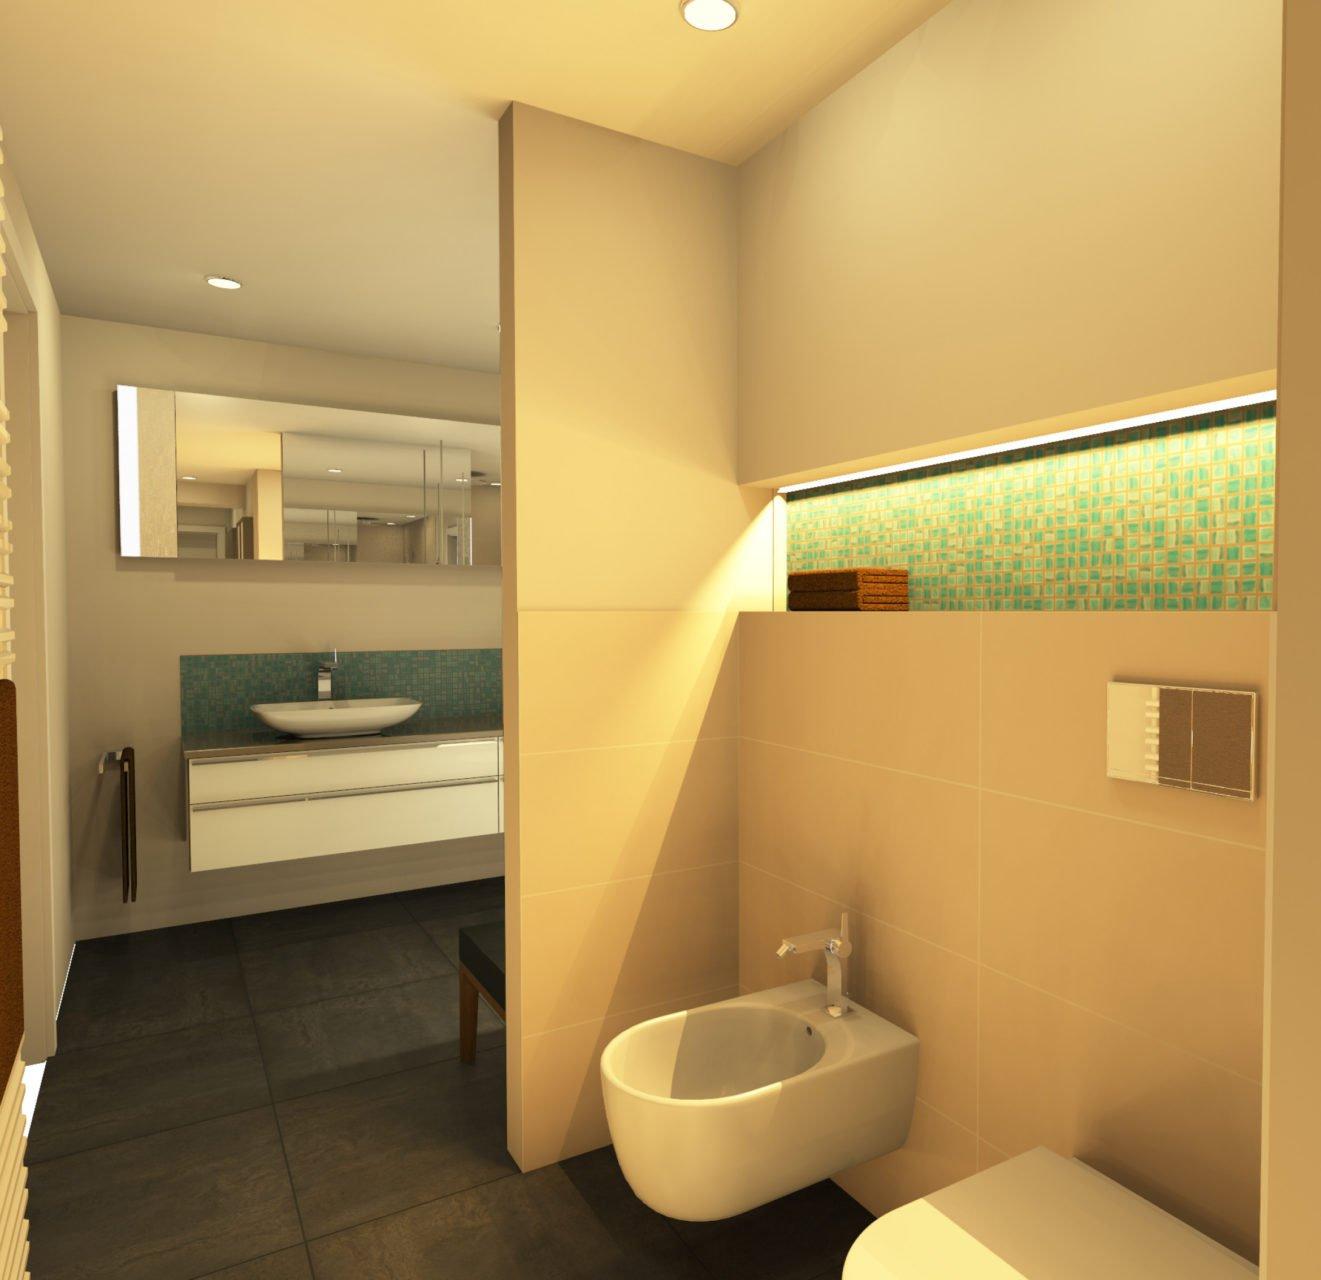 raumkonzept referenz bad 3d planung wc bidet nowak gmbh bergisch gladbach. Black Bedroom Furniture Sets. Home Design Ideas